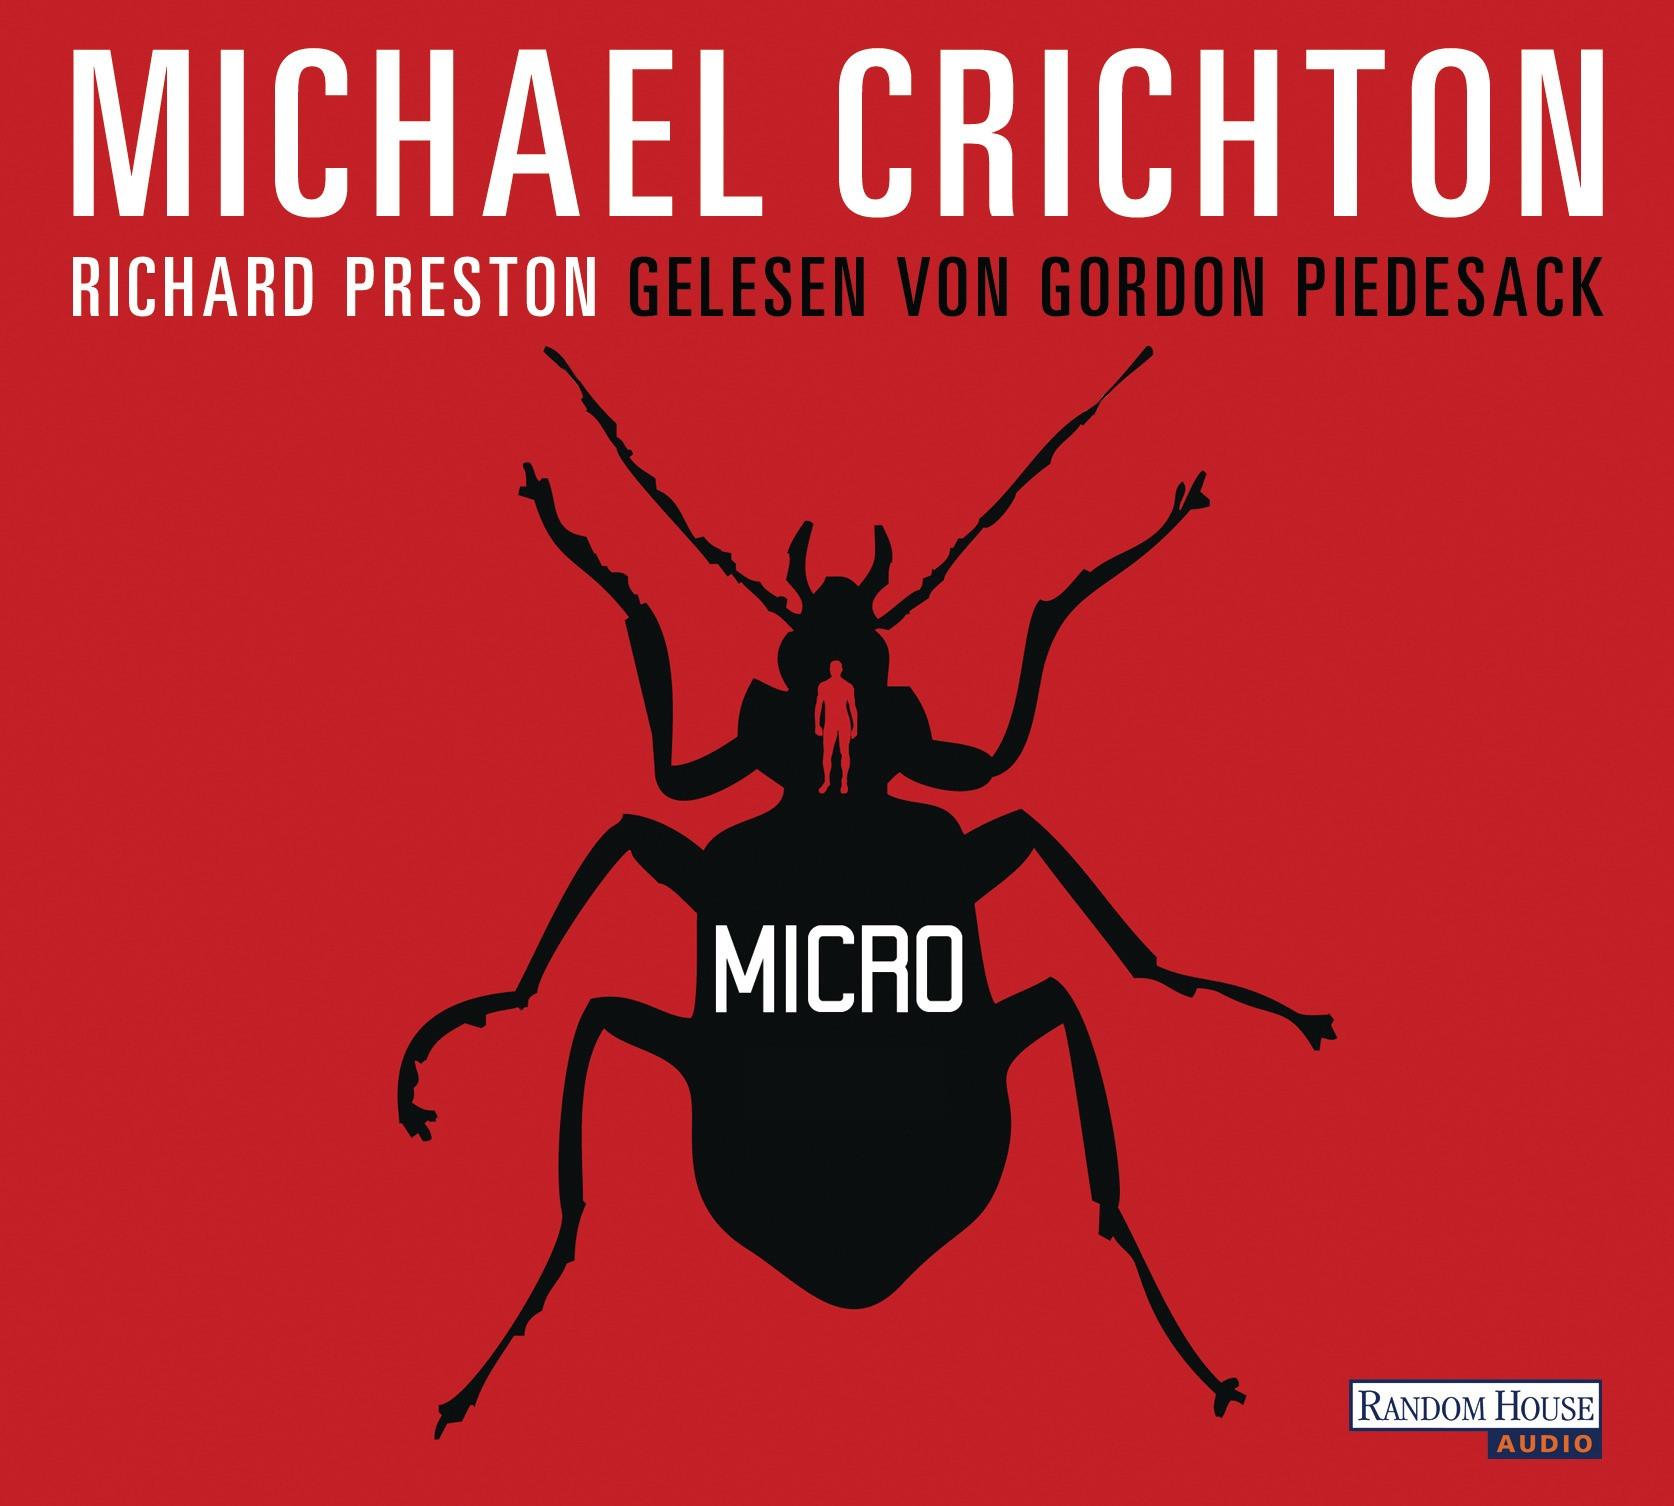 Michael Crichton - Micro